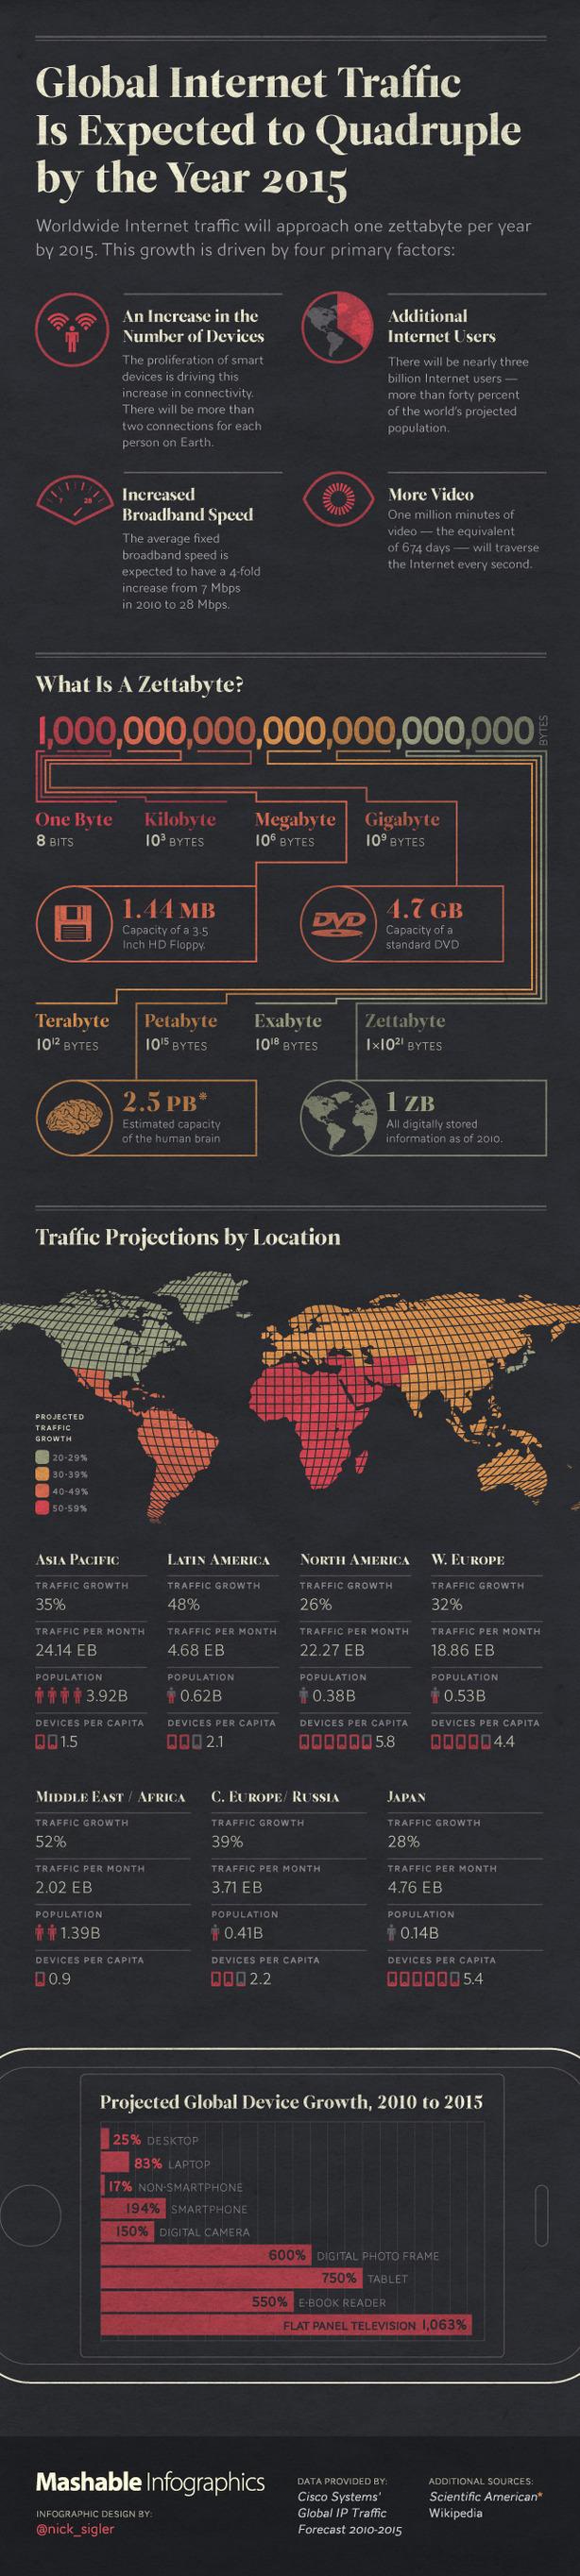 global-internet-traffic-mashable-infographics-640.jpg